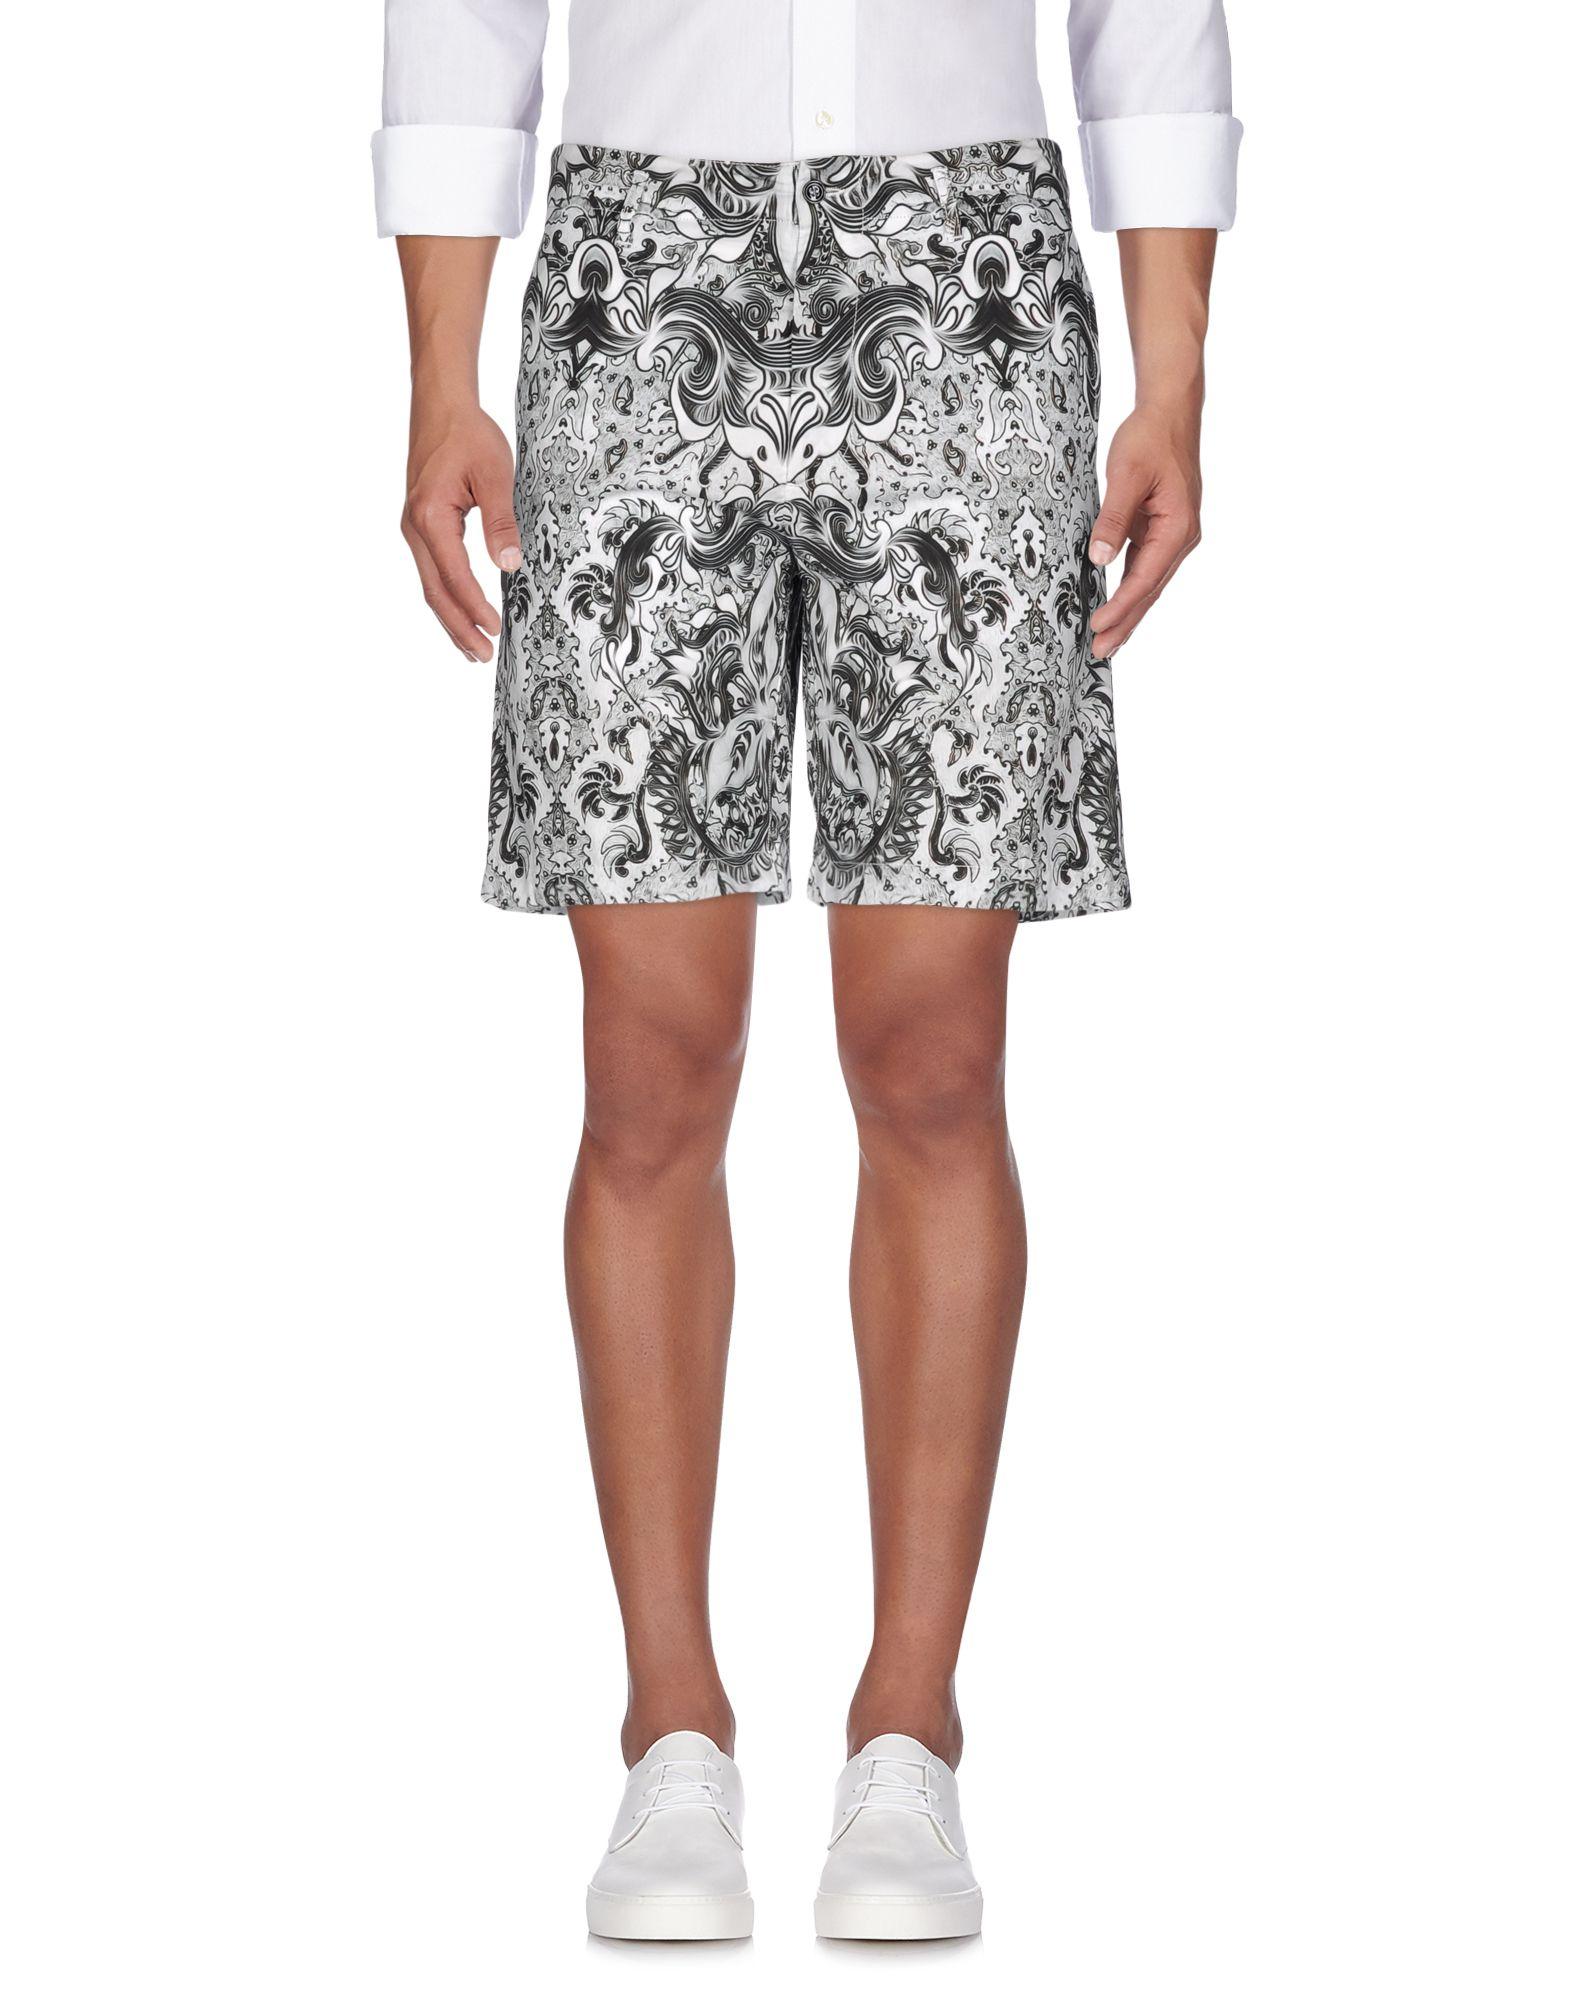 Pantalone Classico Just Cavalli Uomo - Acquista online su